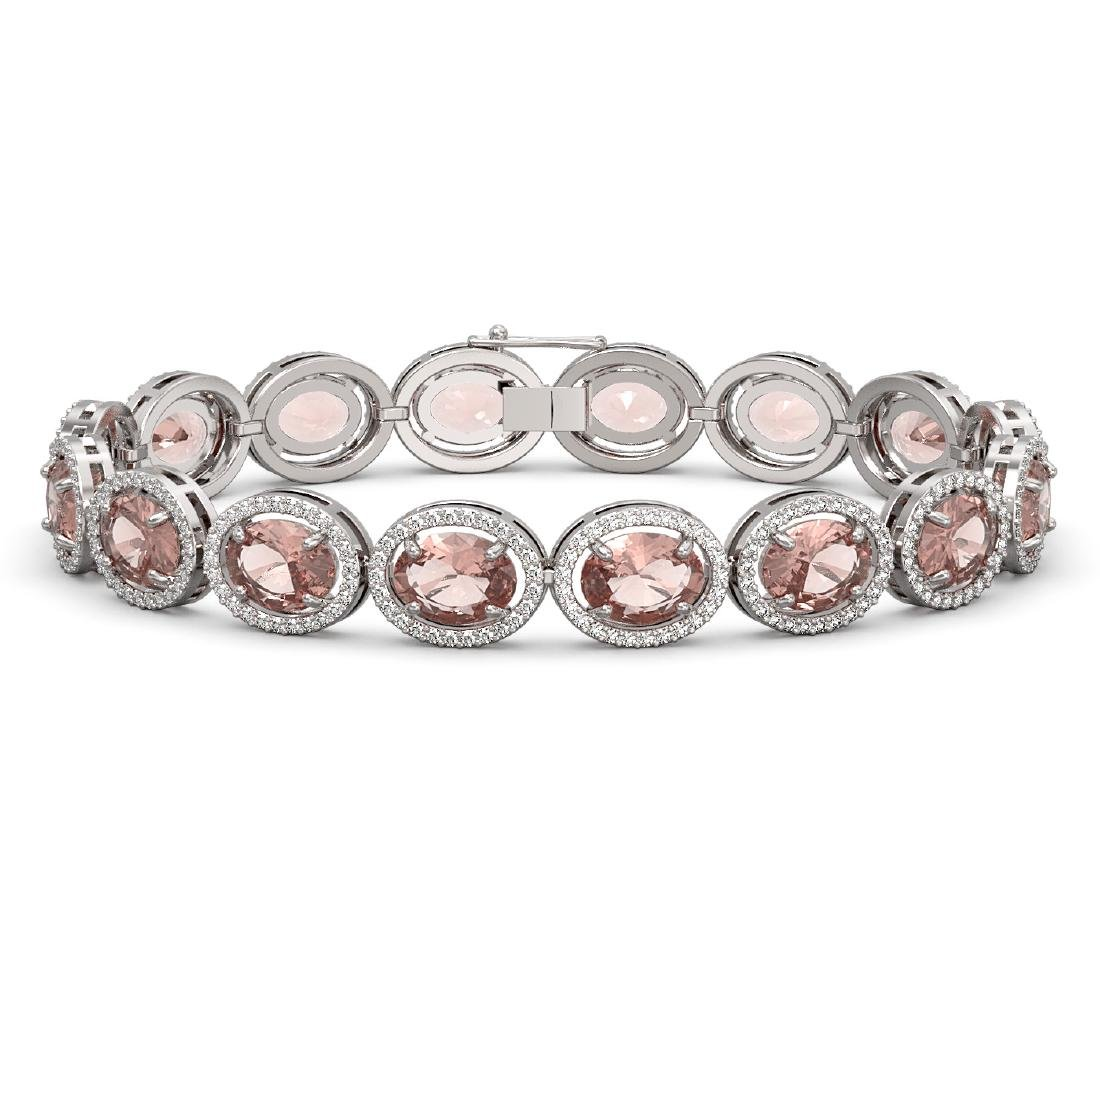 22.8 CTW Morganite & Diamond Halo Bracelet 10K White